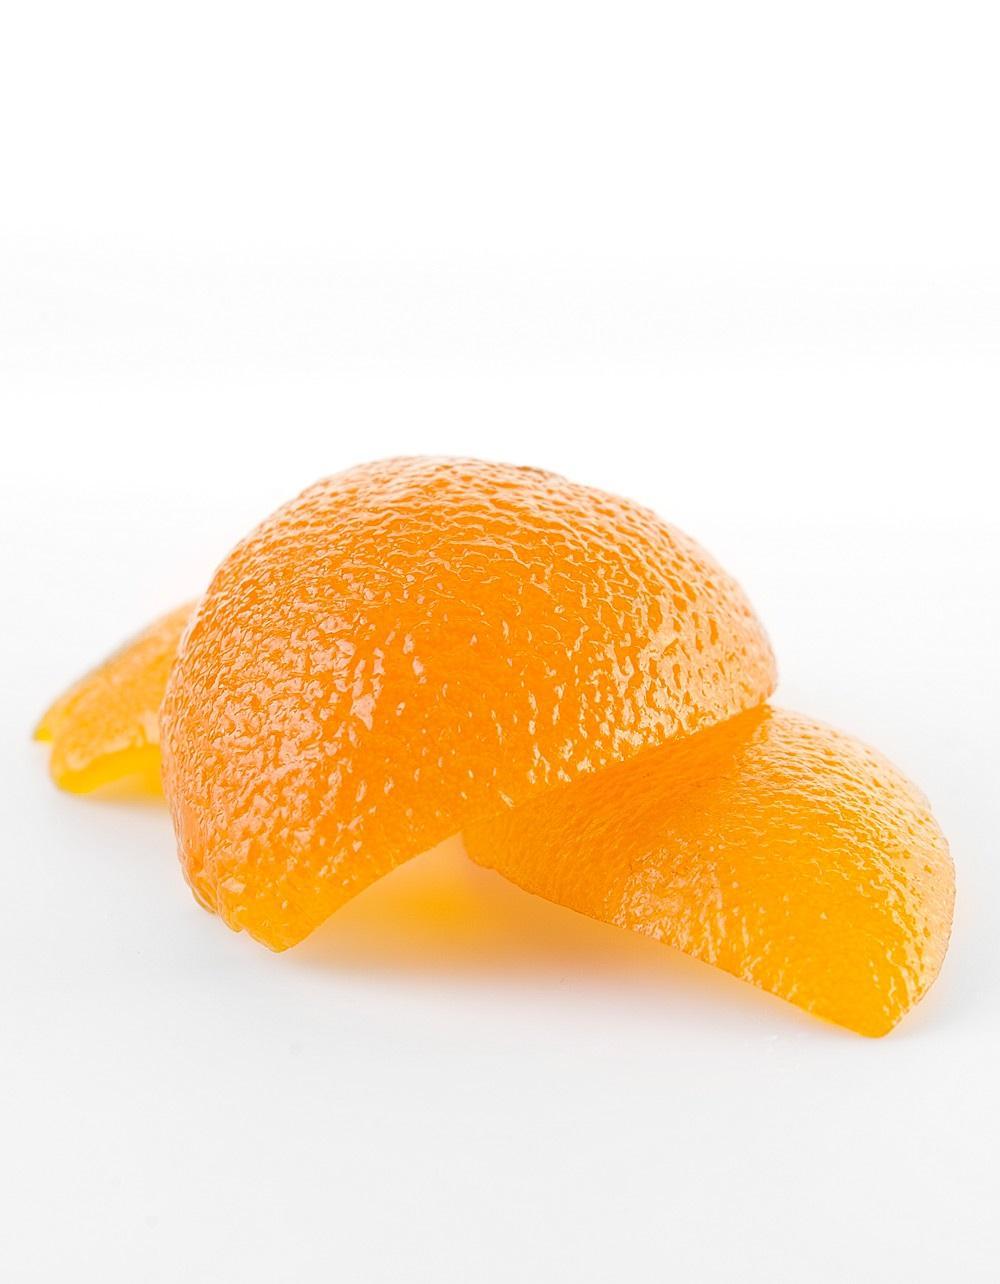 Candied Orange Peel Quarters The Essential Ingredient 1kg